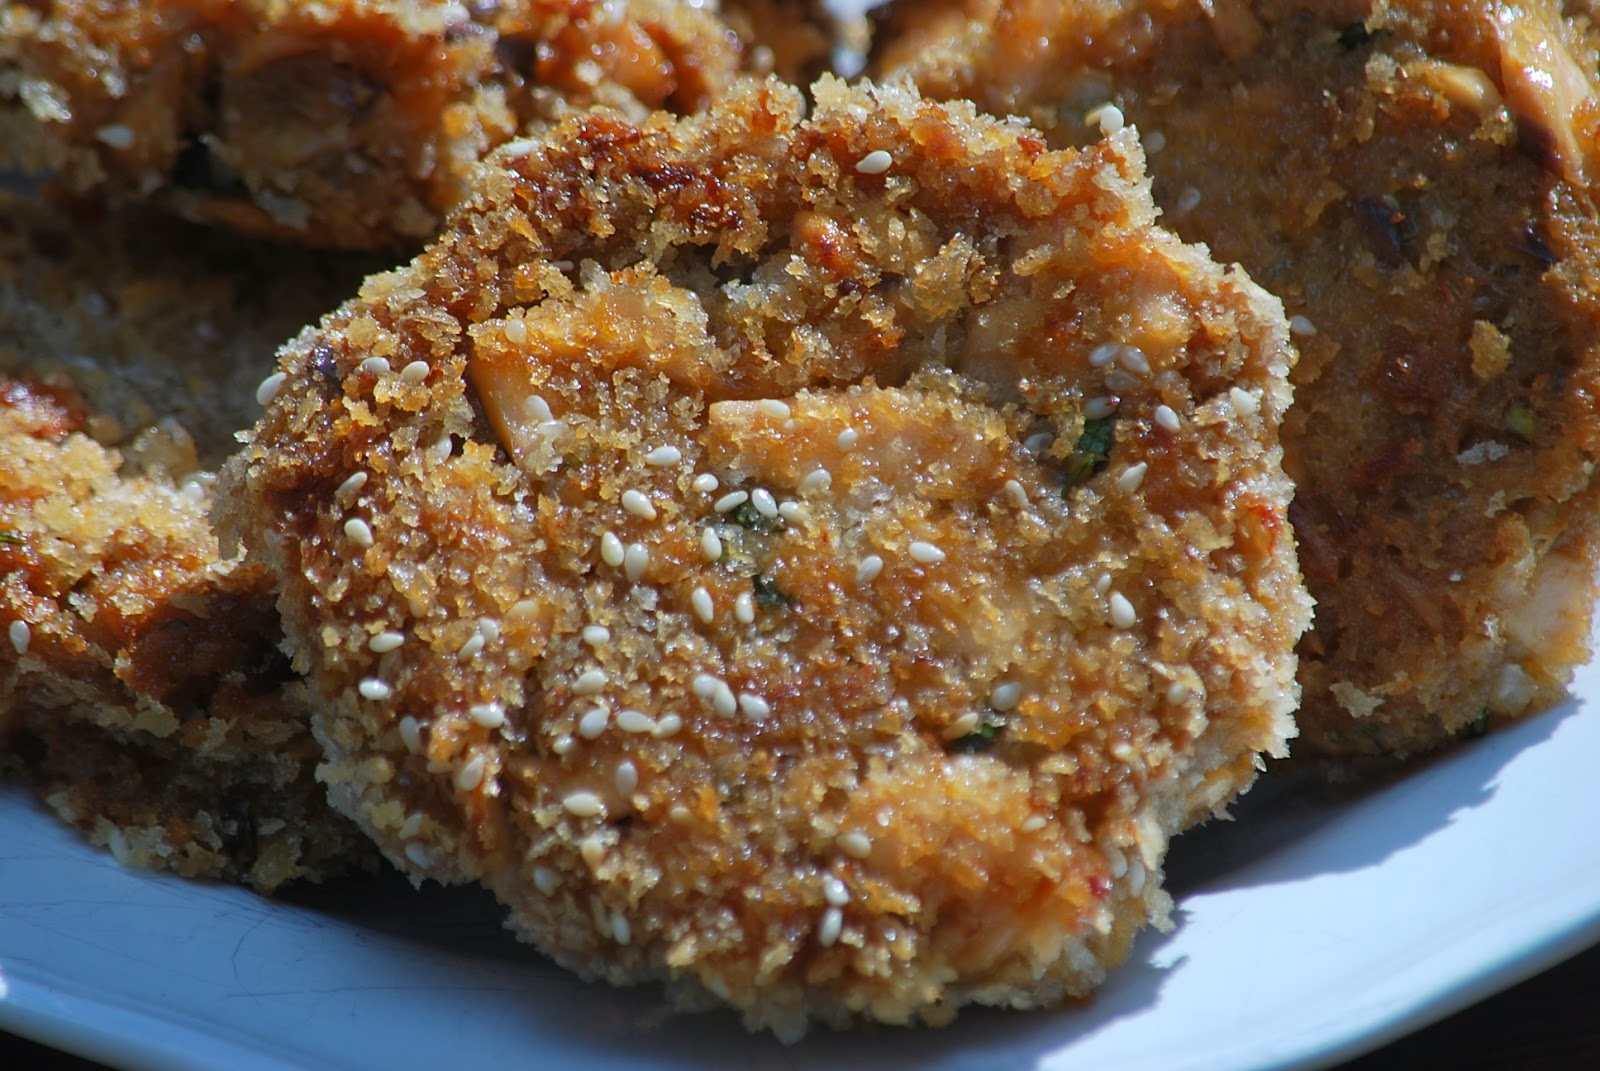 My story in recipes: Salmon Patties